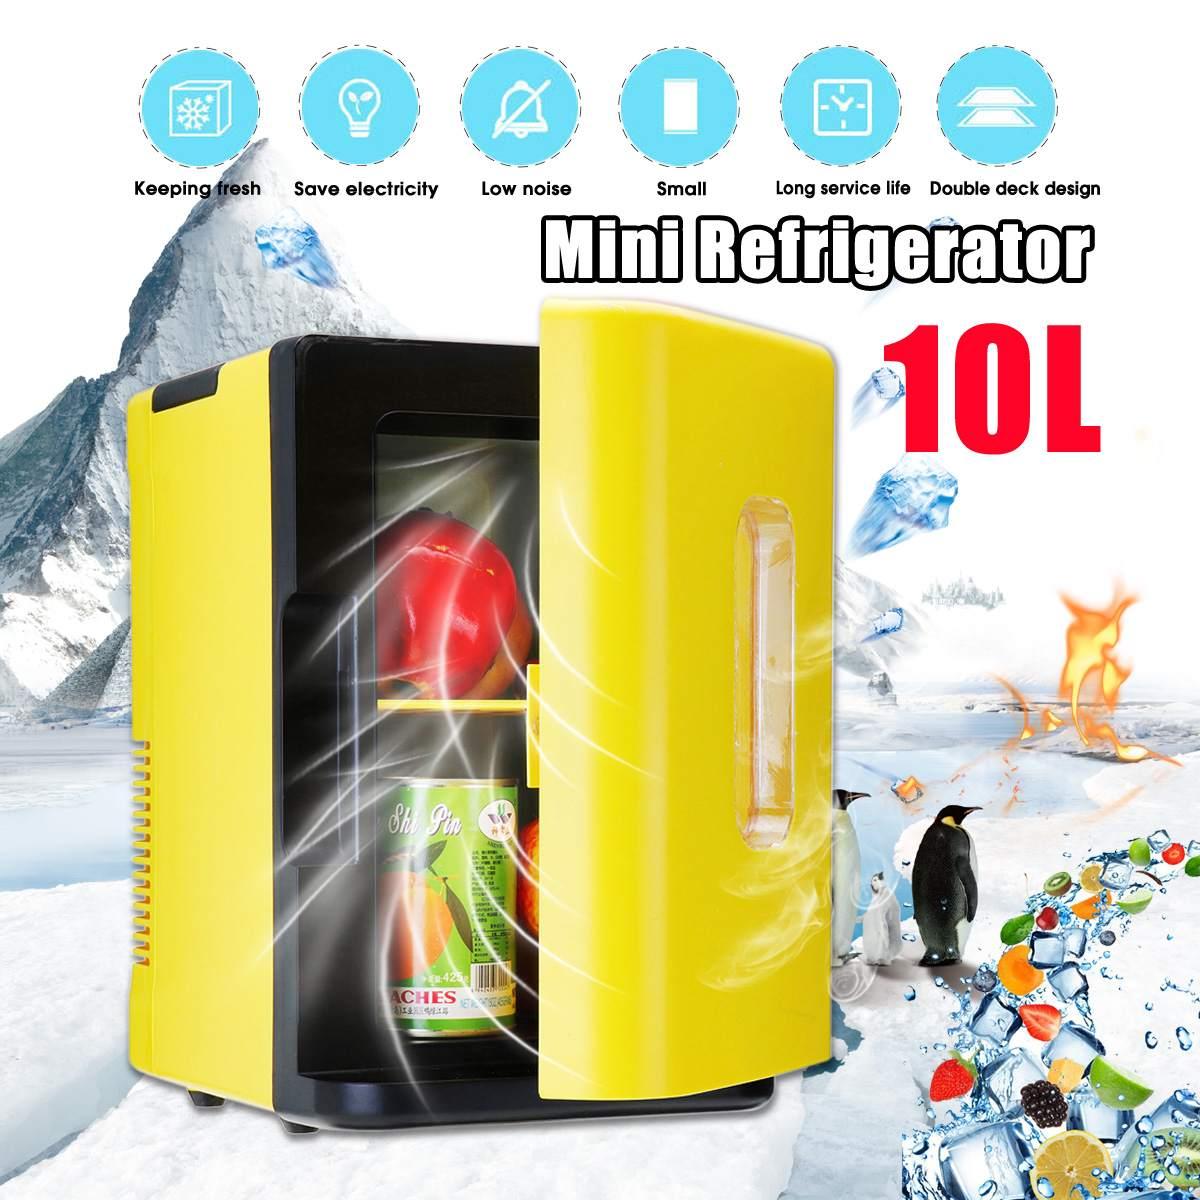 Electric Car Refrigerator 10L…